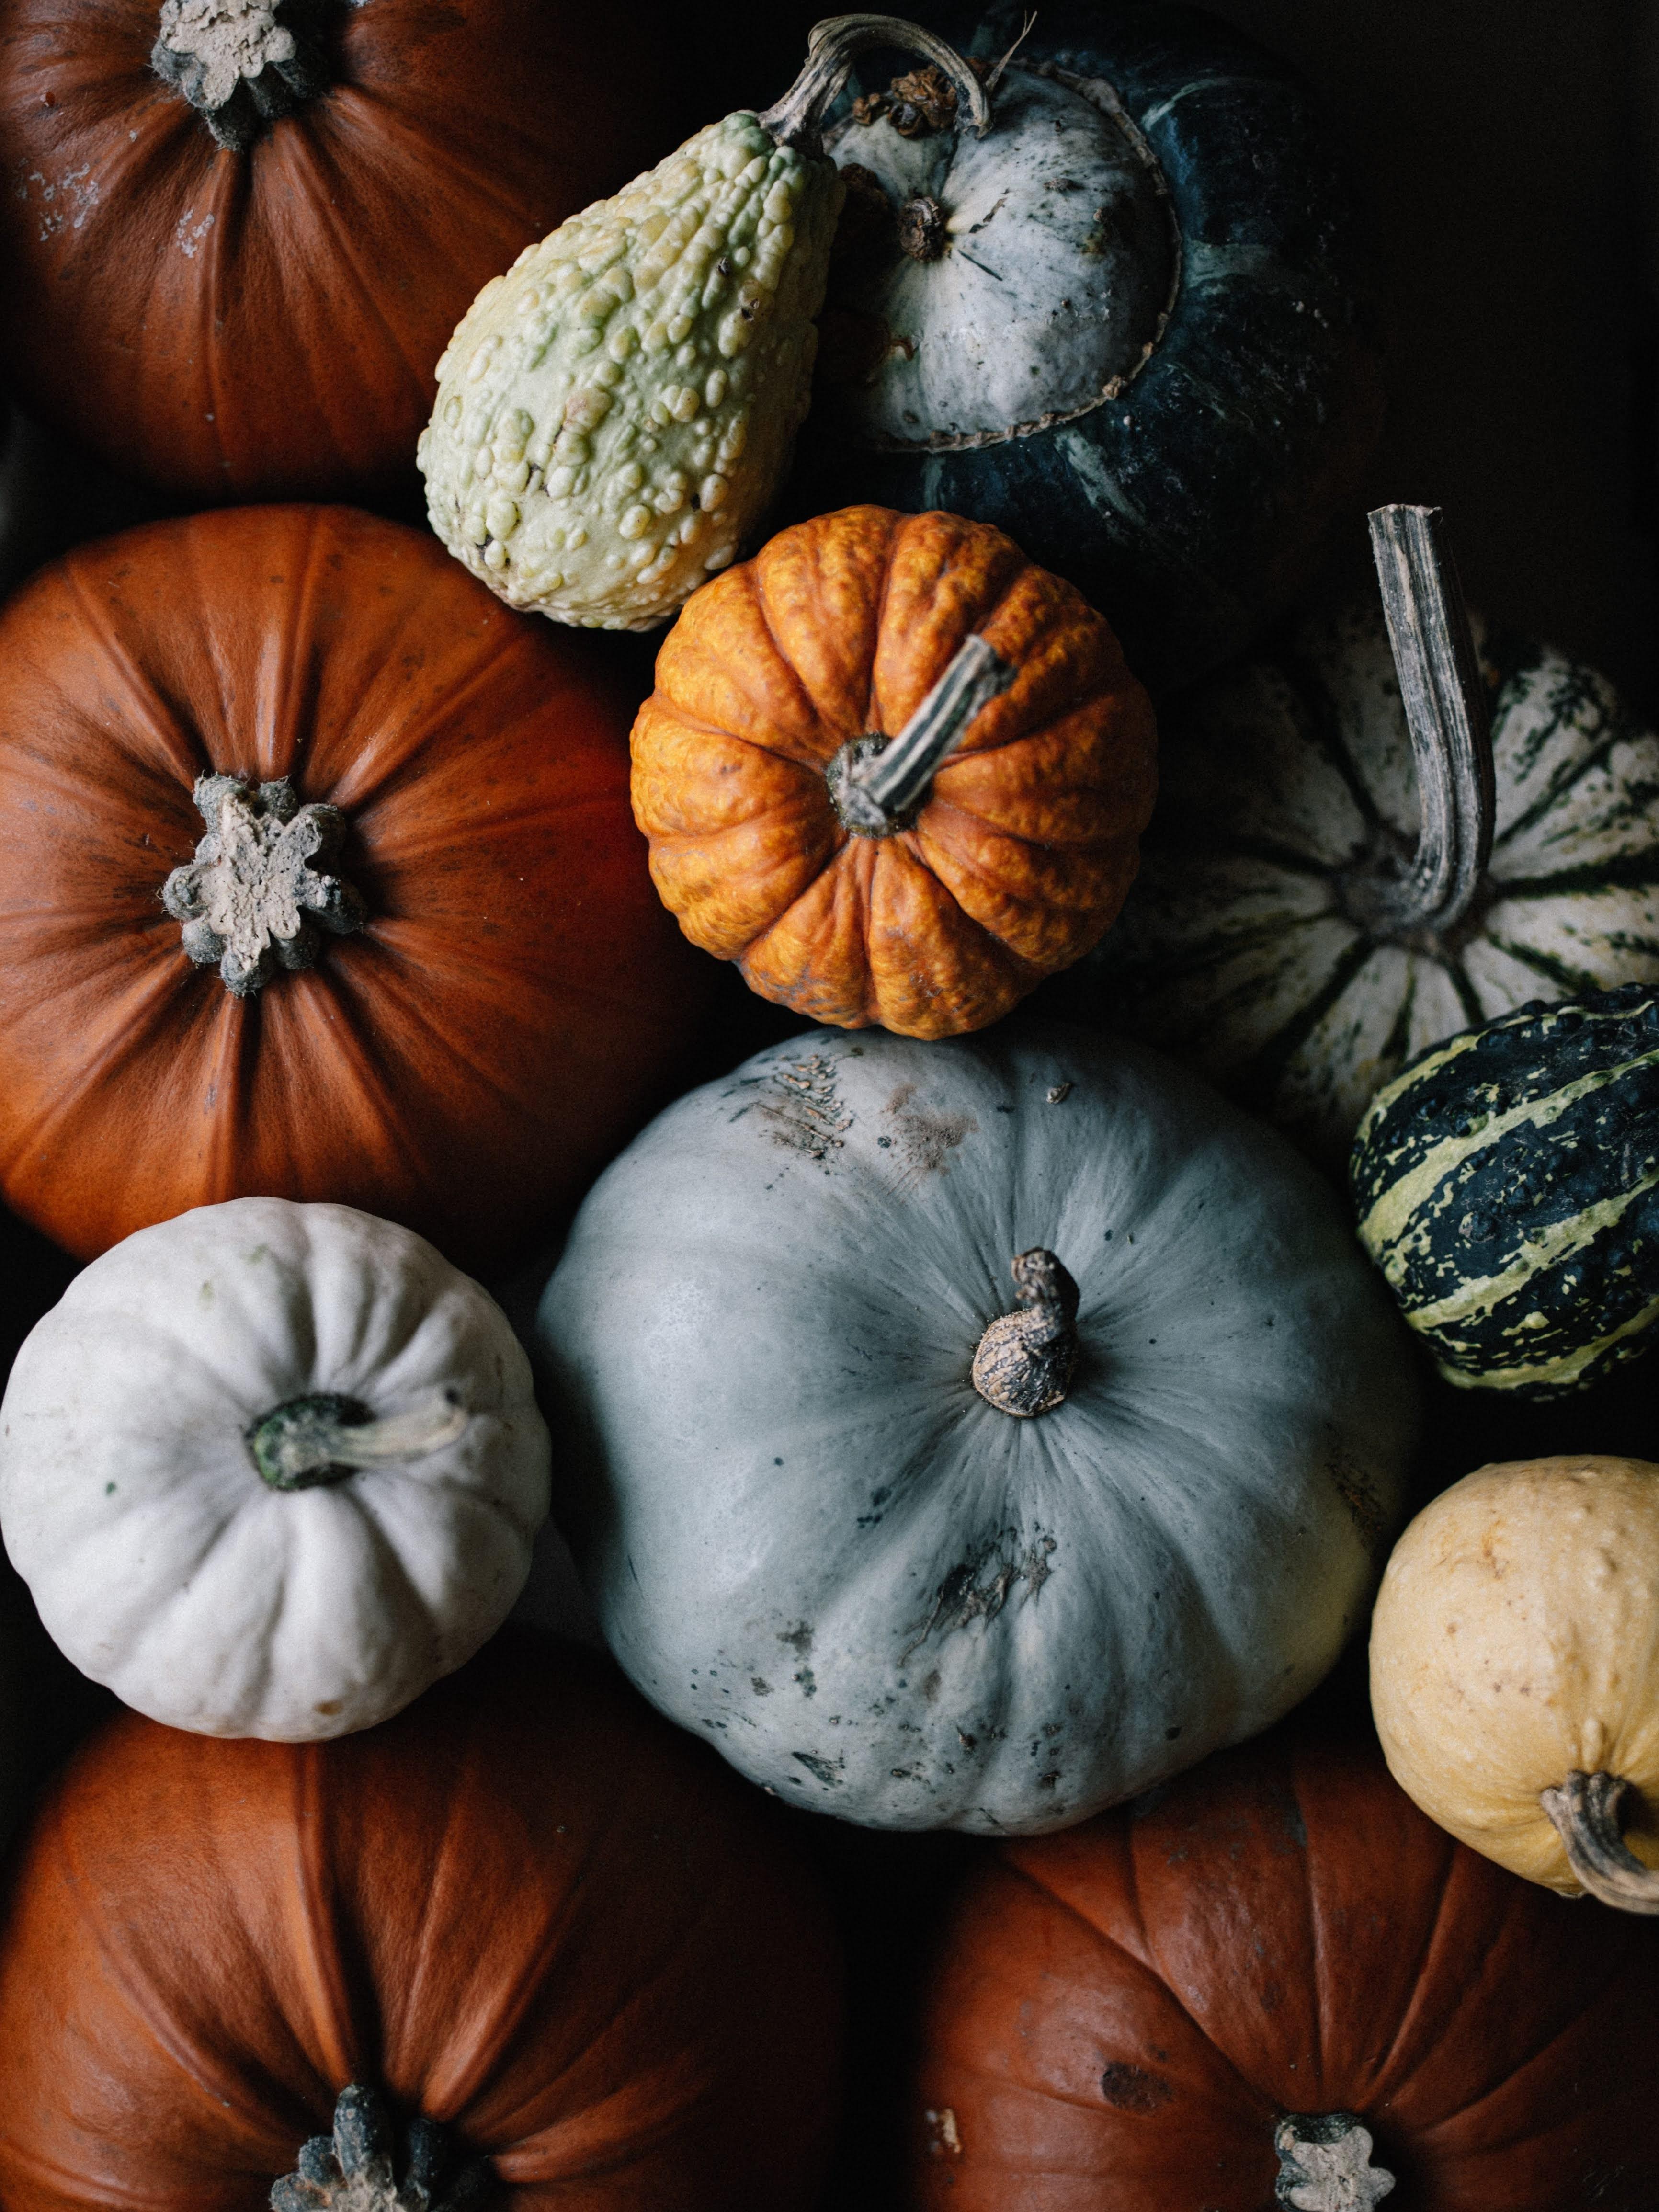 Assortment of Fall Pumpkins and Gourds | Photo by Annie Spratt via Unsplash